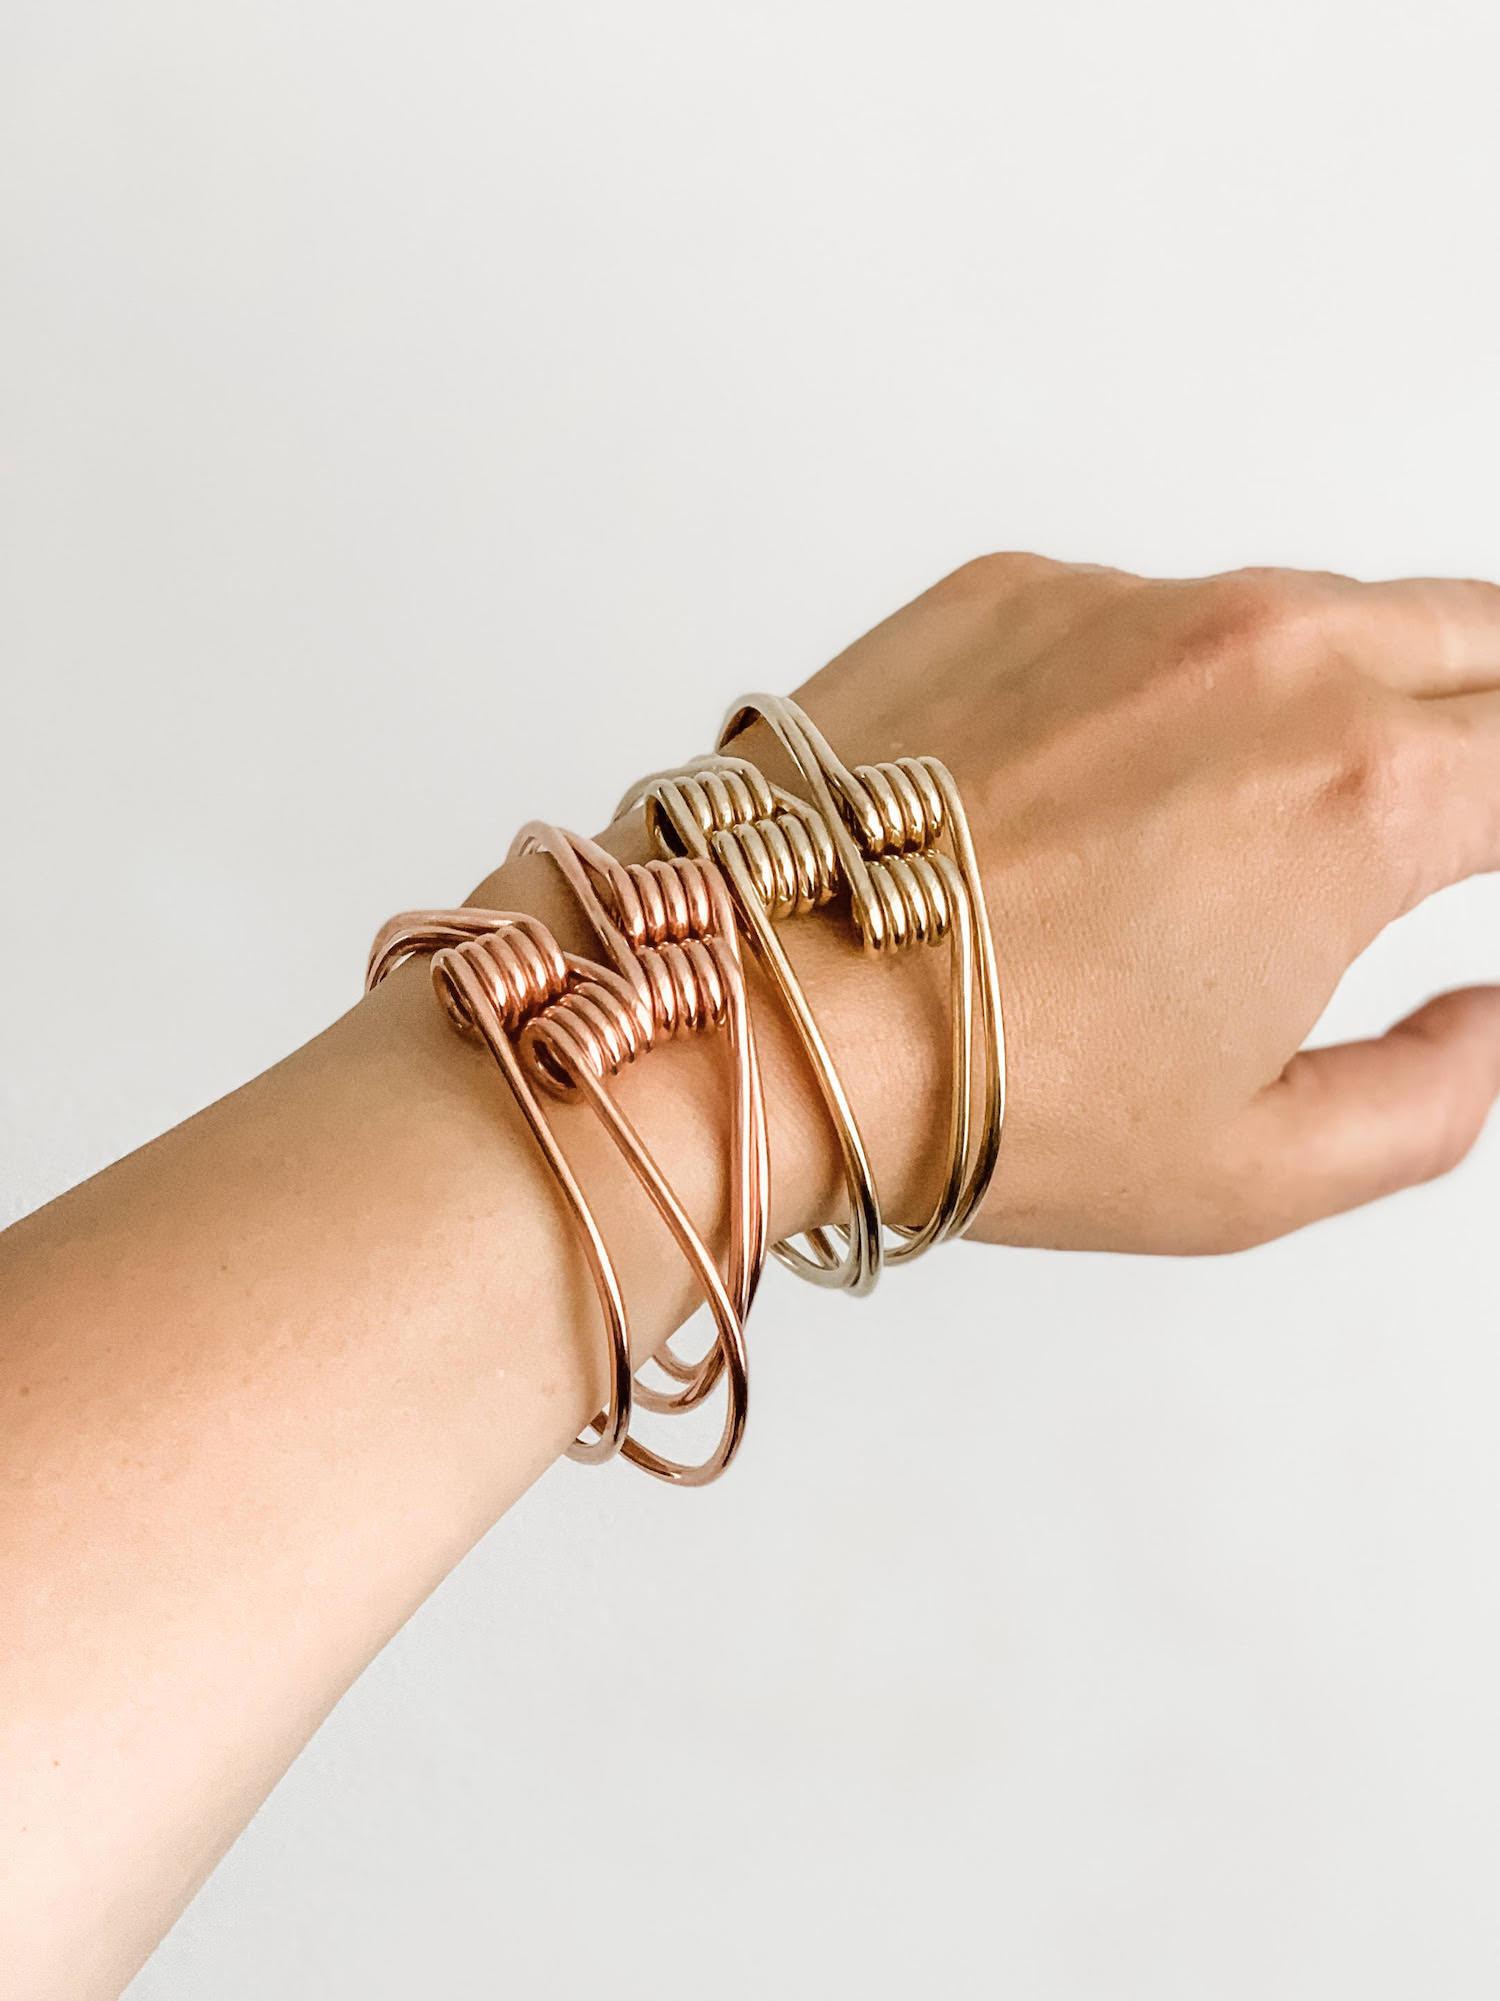 H Works jewelry - photo of two bracelets on arm